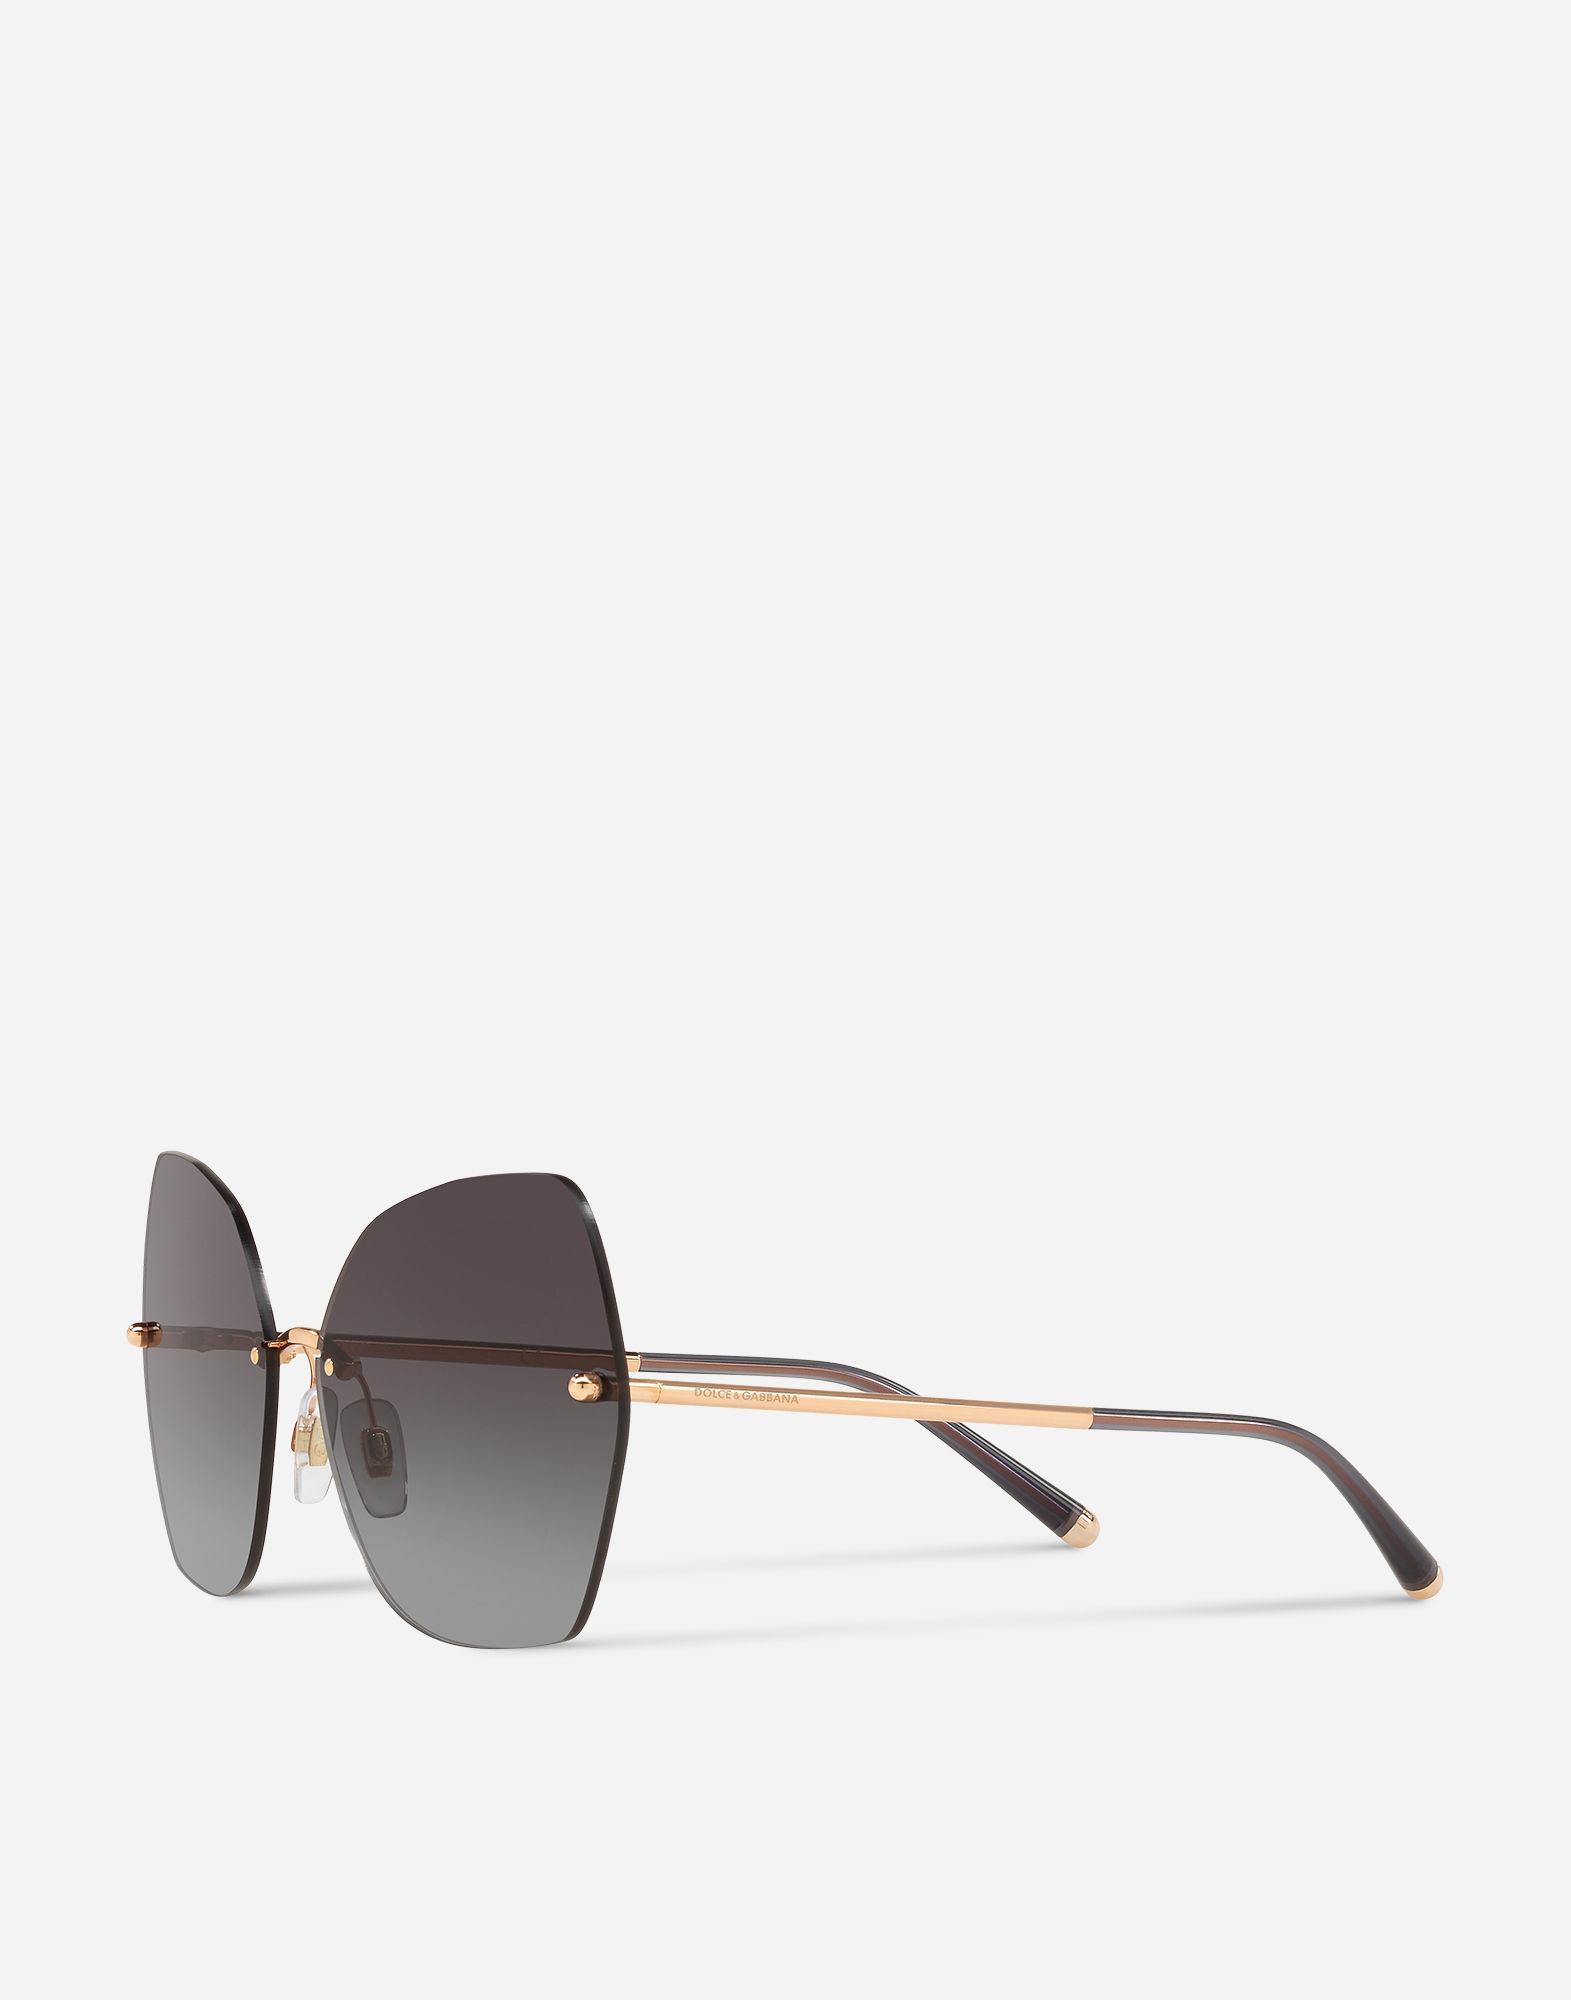 fadd1c8242 Lyst - Dolce   Gabbana Butterfly Sunglasses With Metal Details in Metallic